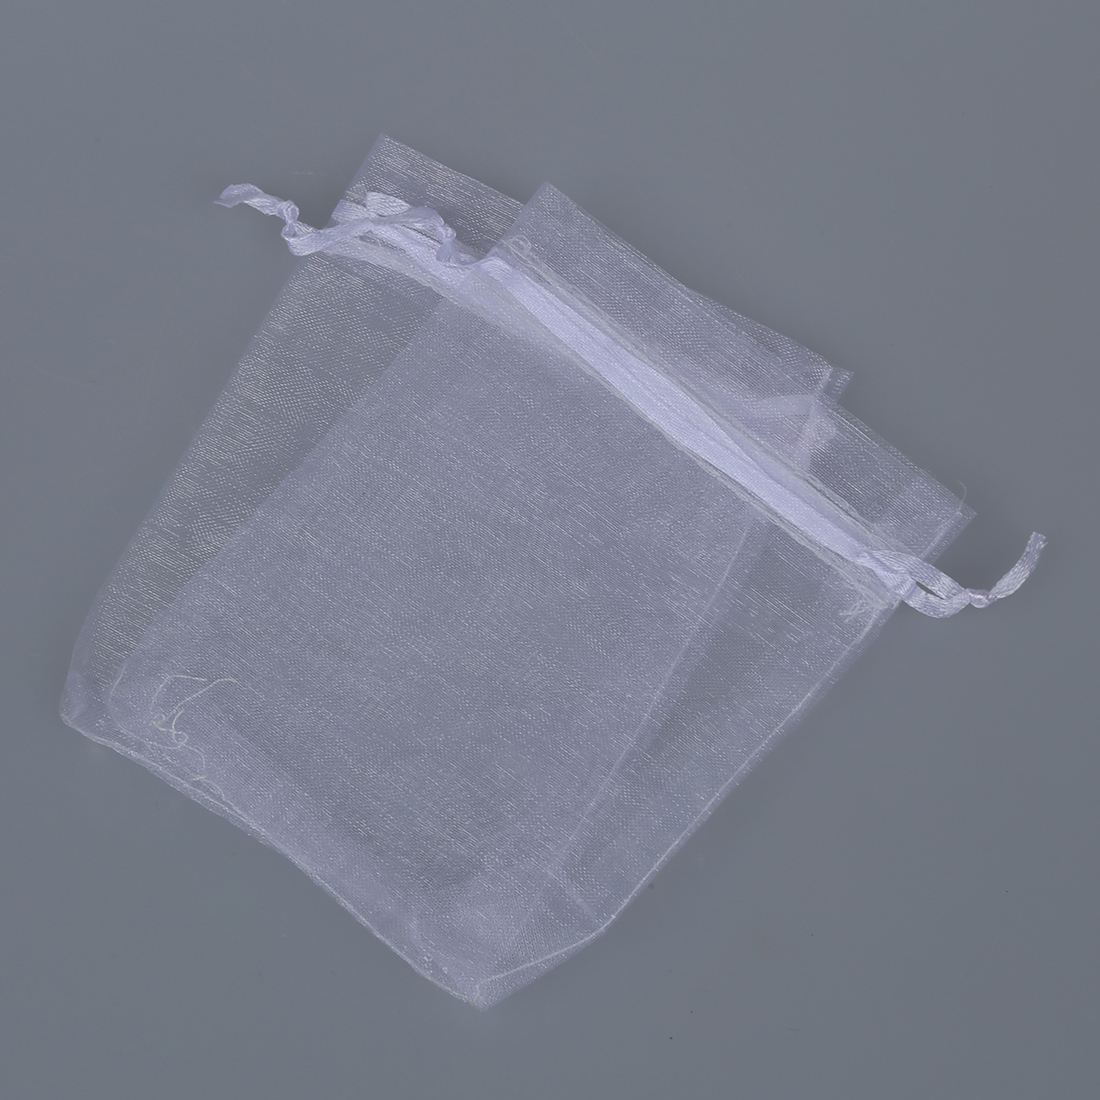 5 pcs of 100pcs White Eyelash Organza Drawstring Pouches Jewelry Party Wedding Favor Gift Bags 4X5